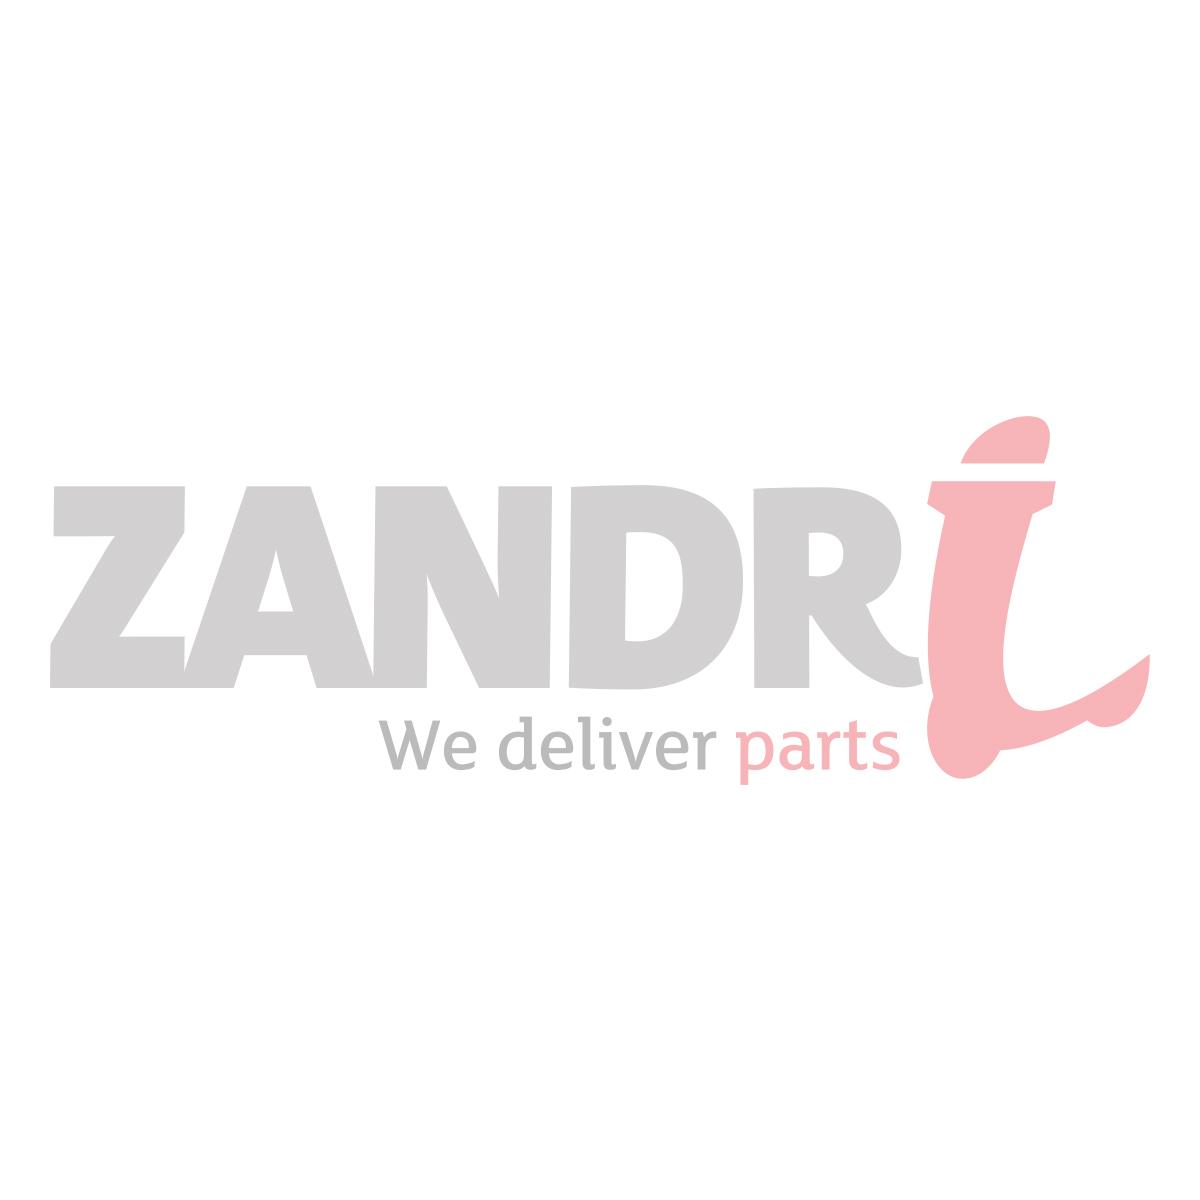 Onderspoiler / sideskirt set + schroefset Yamaha Aerox Dmp carbon